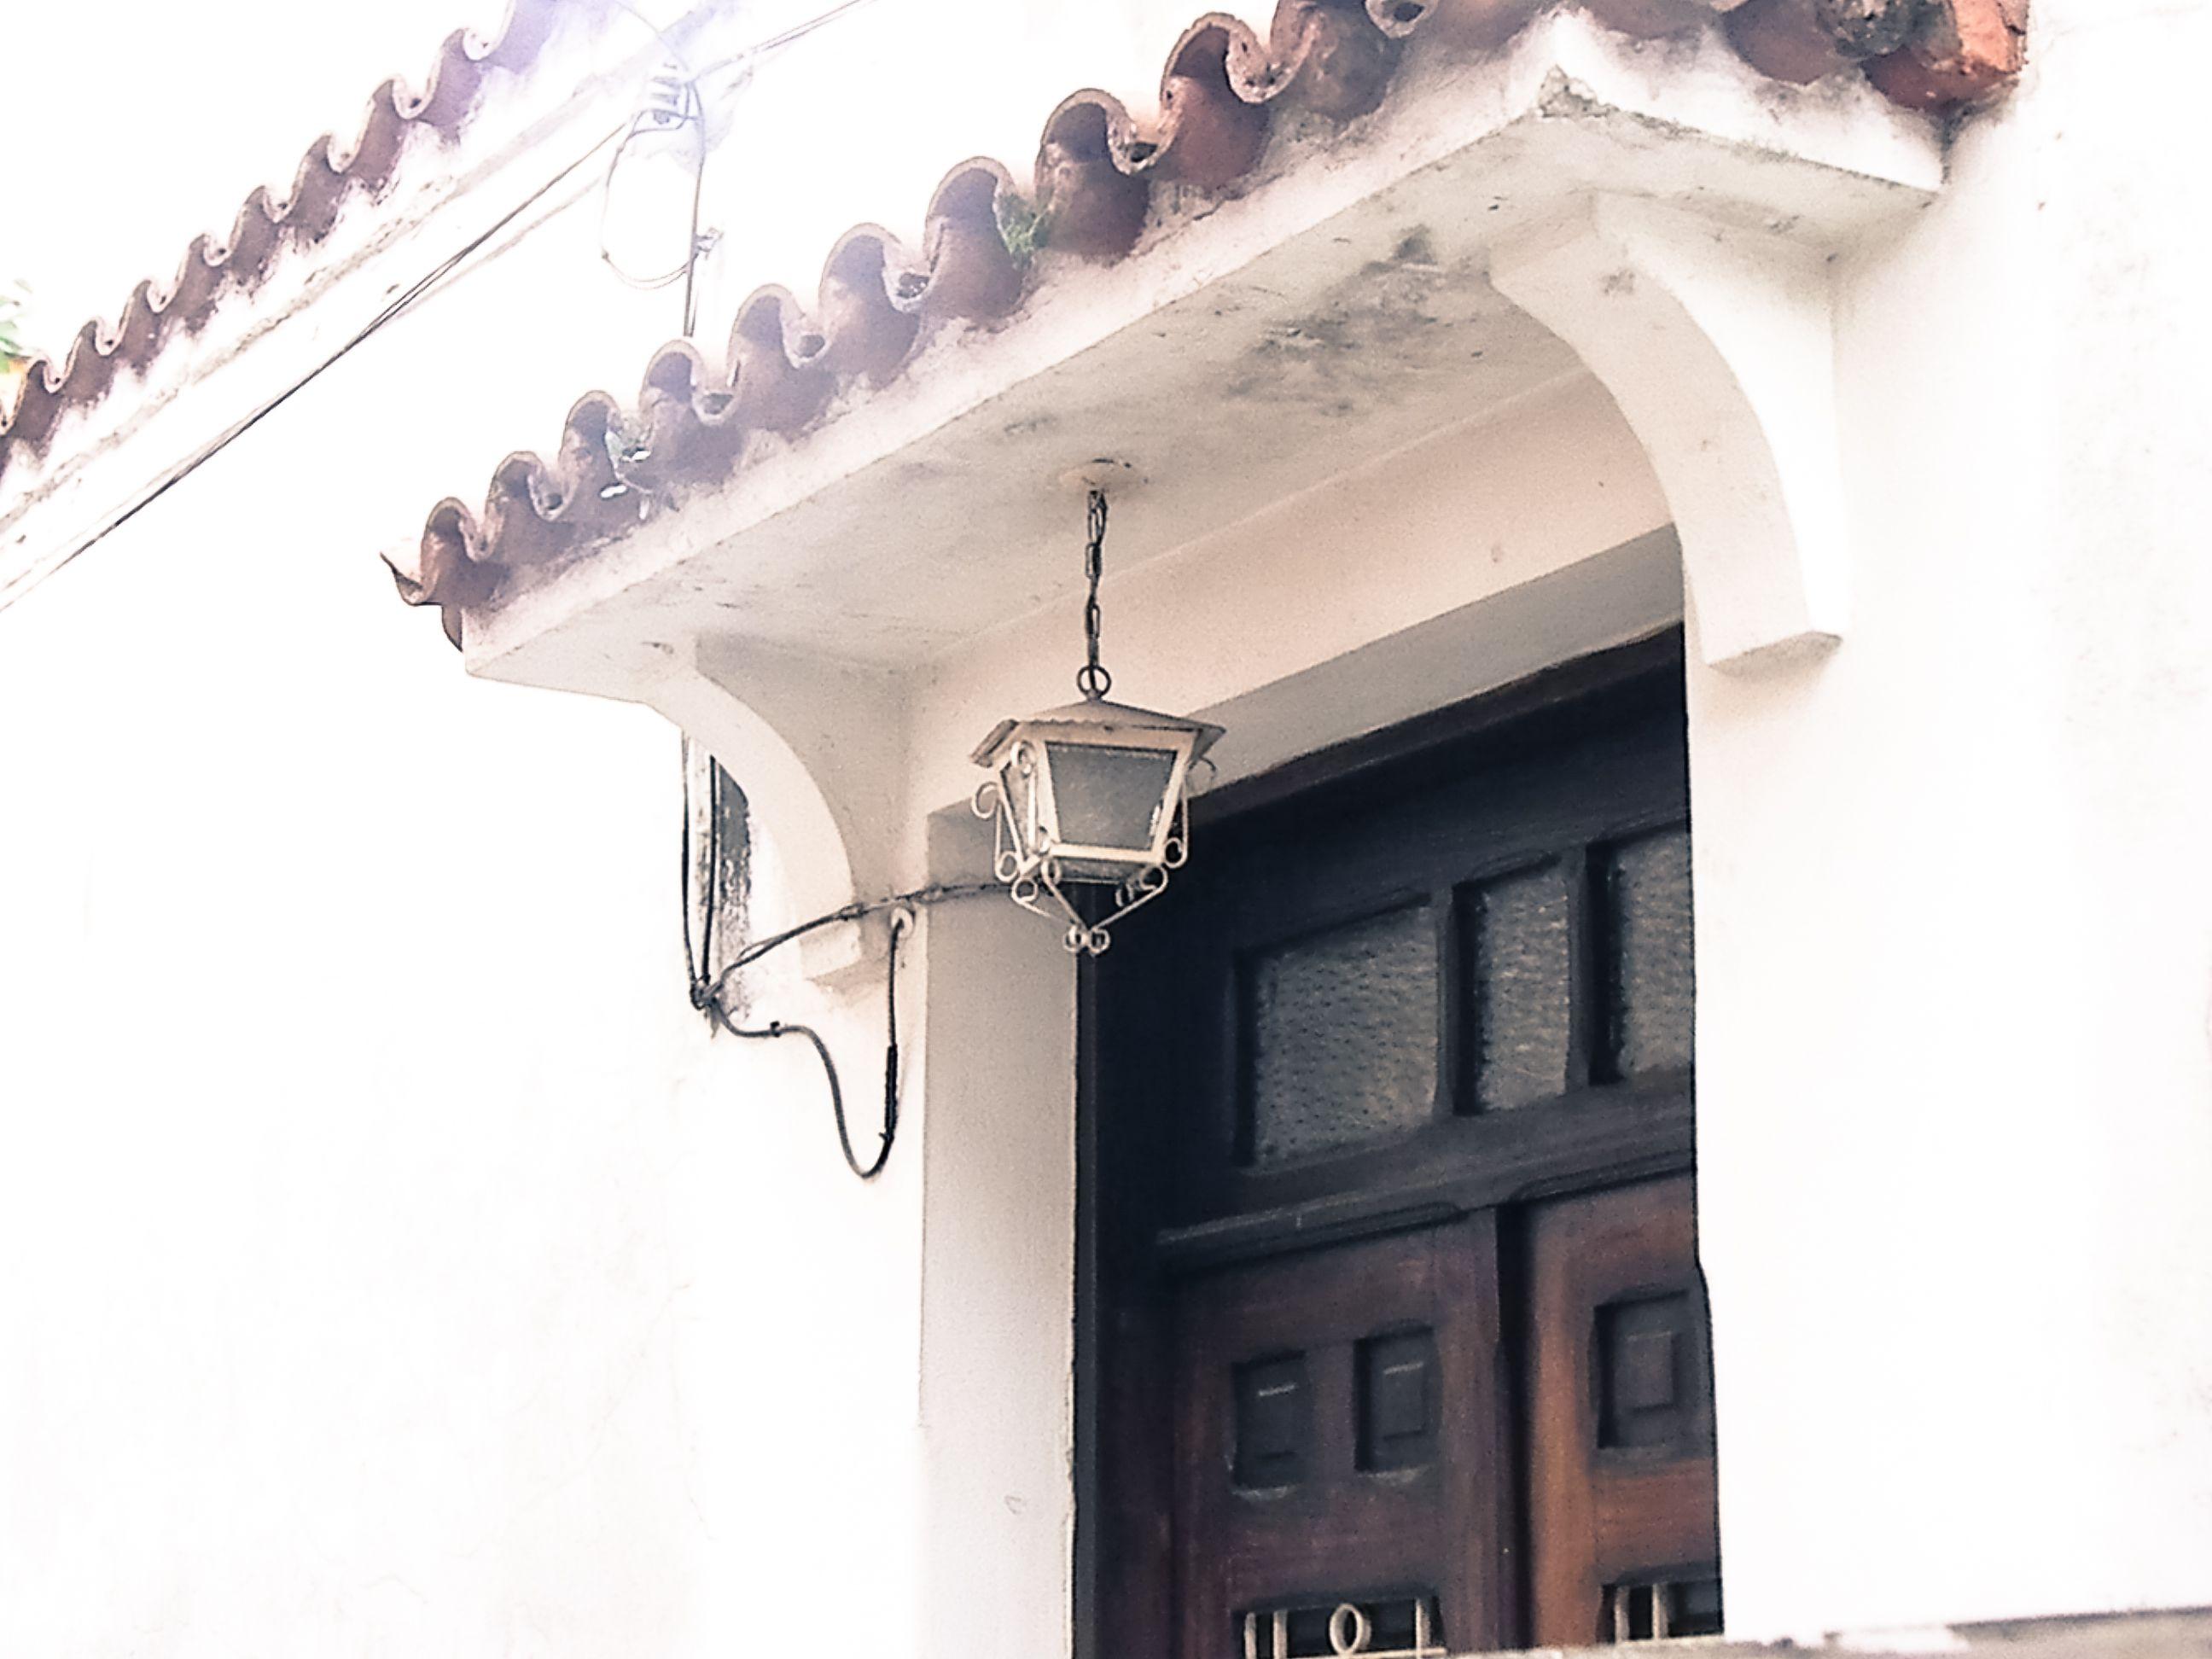 São Paulo's old architecture #2